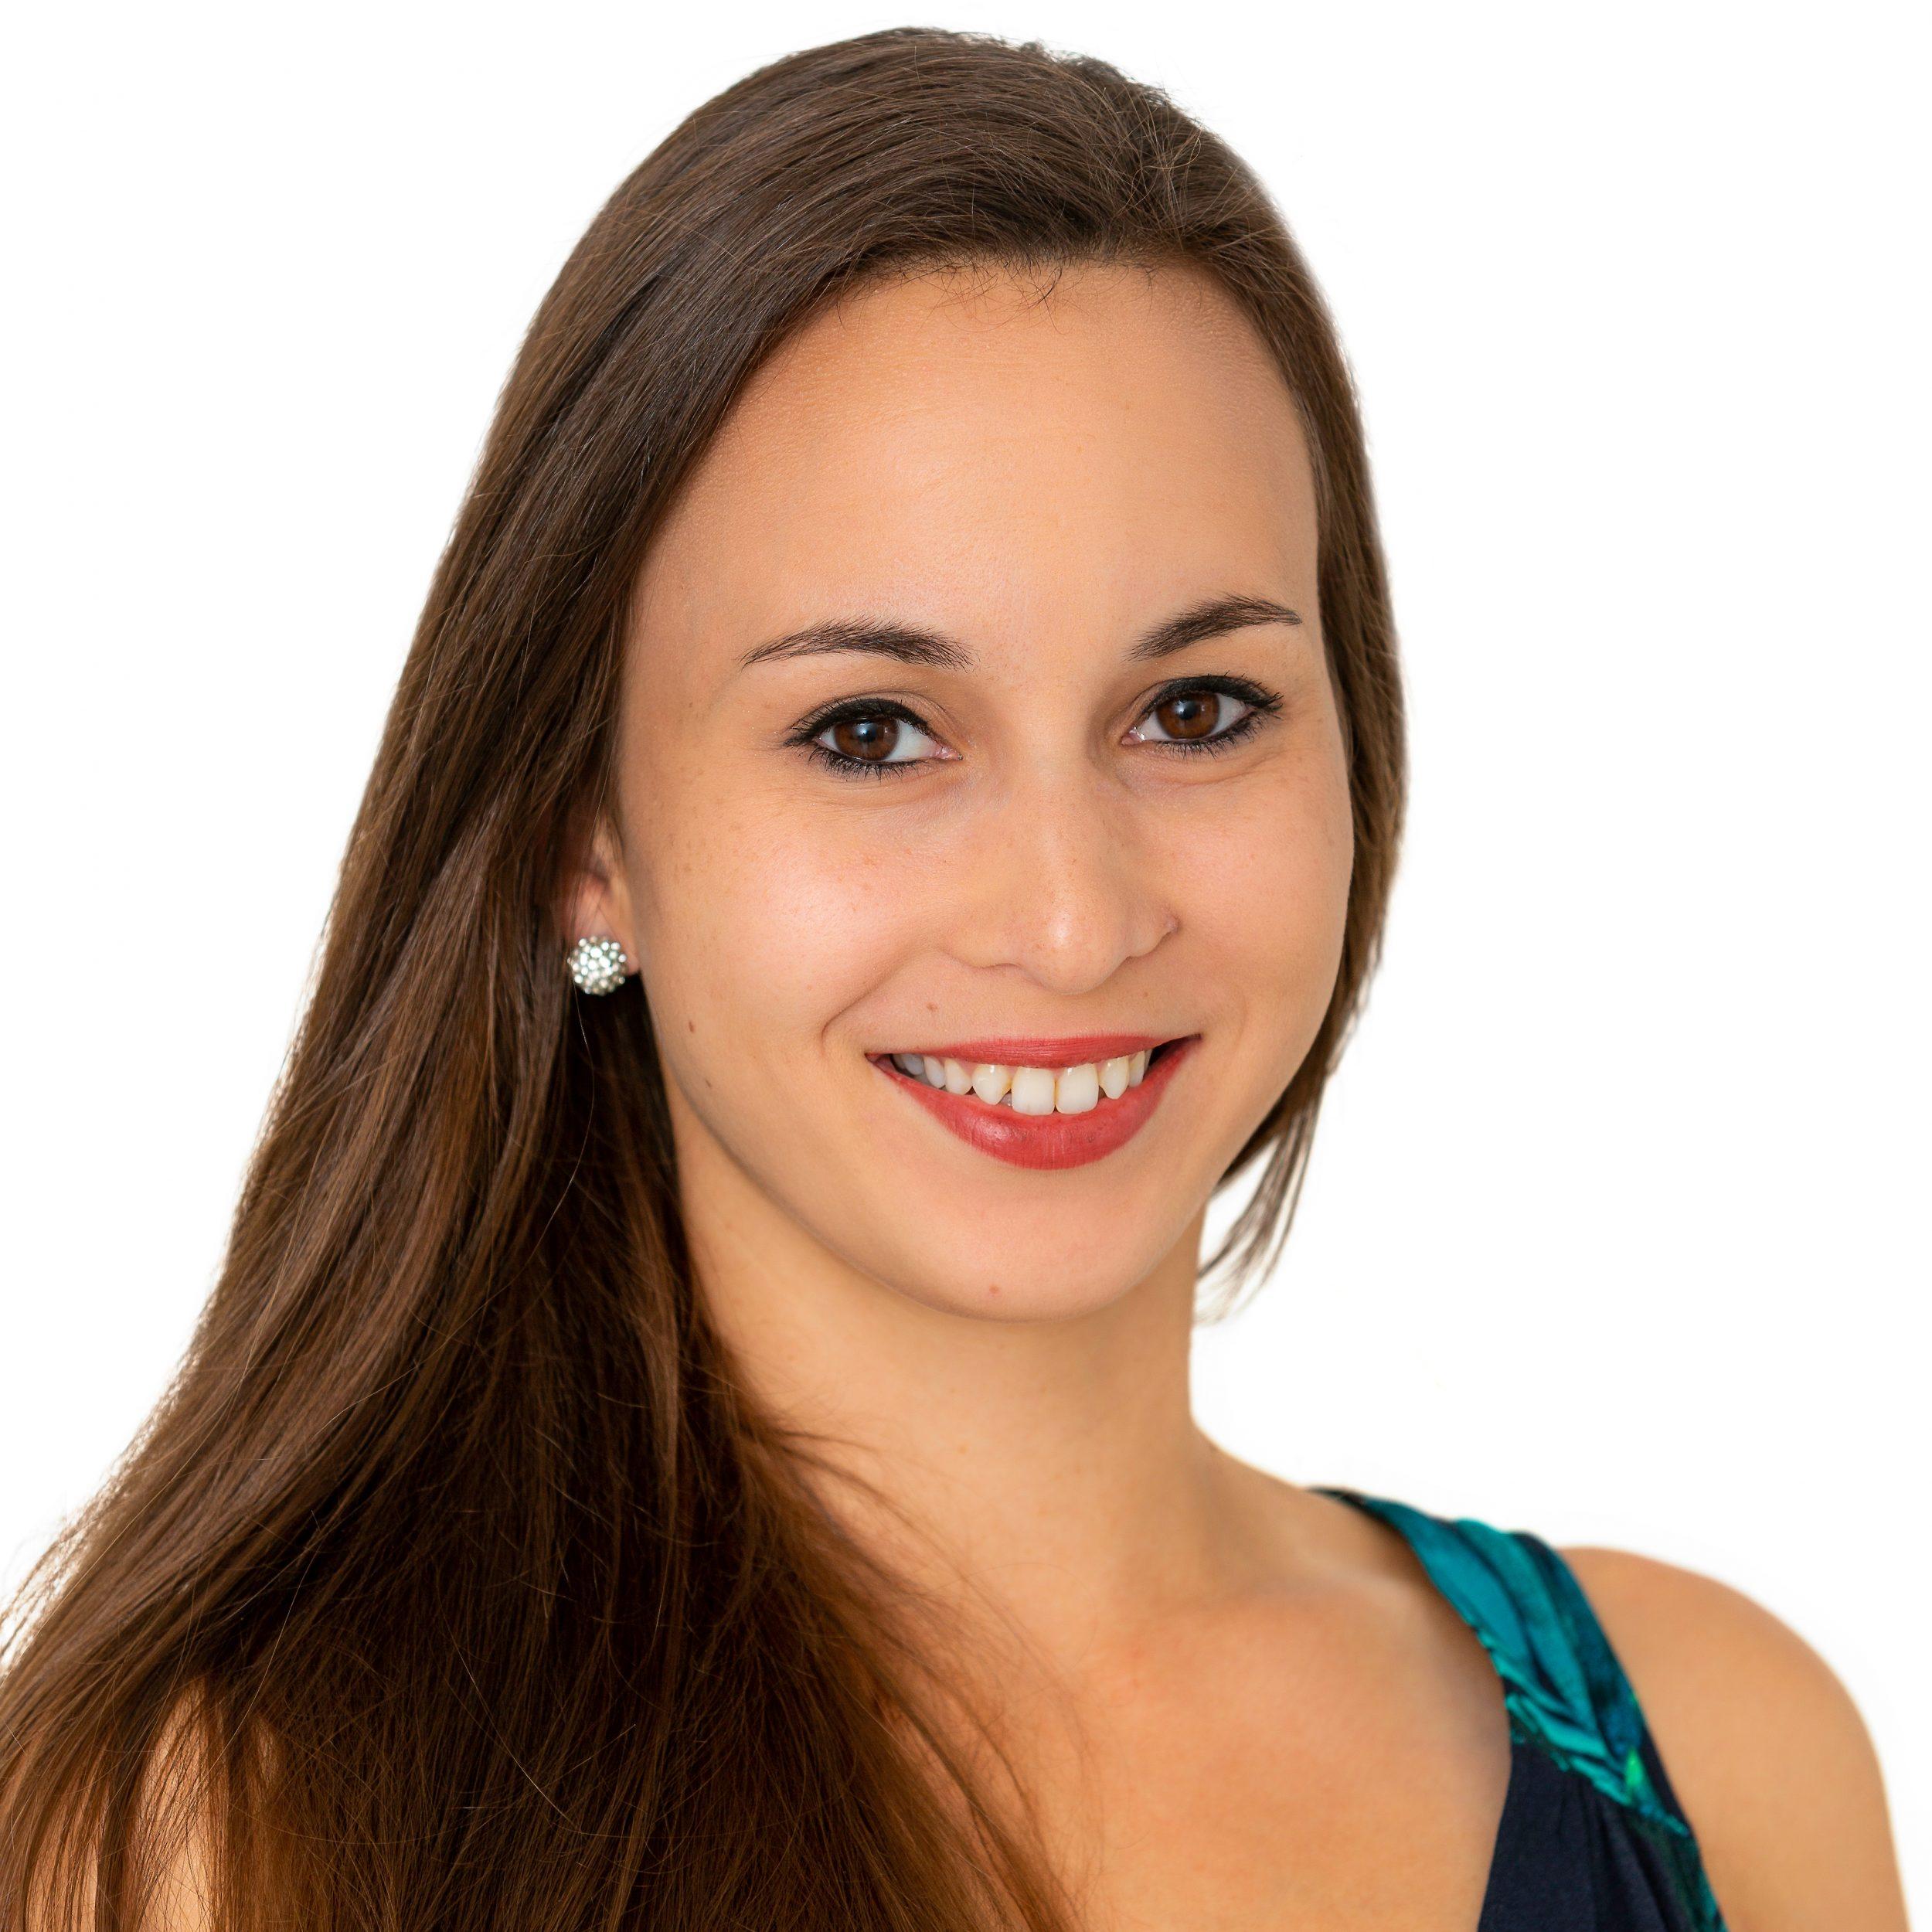 Aleksandra Ordoñez